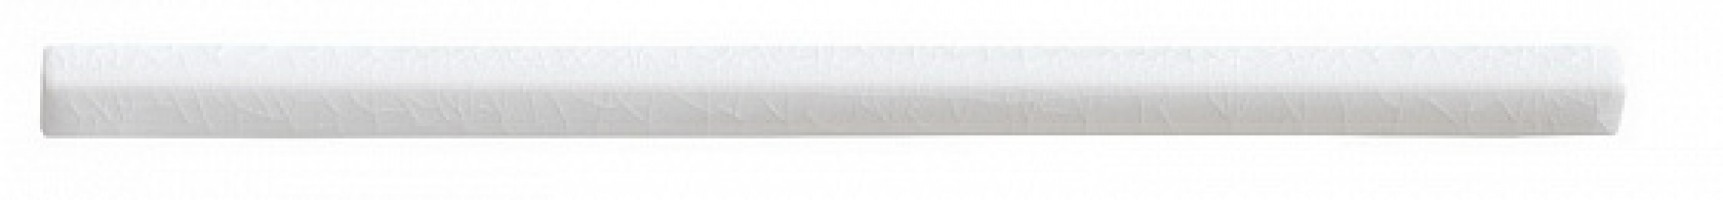 Бордюр Modernista ADMO5419 Bullnose Trim C/C Blanco 0.85x15 Adex